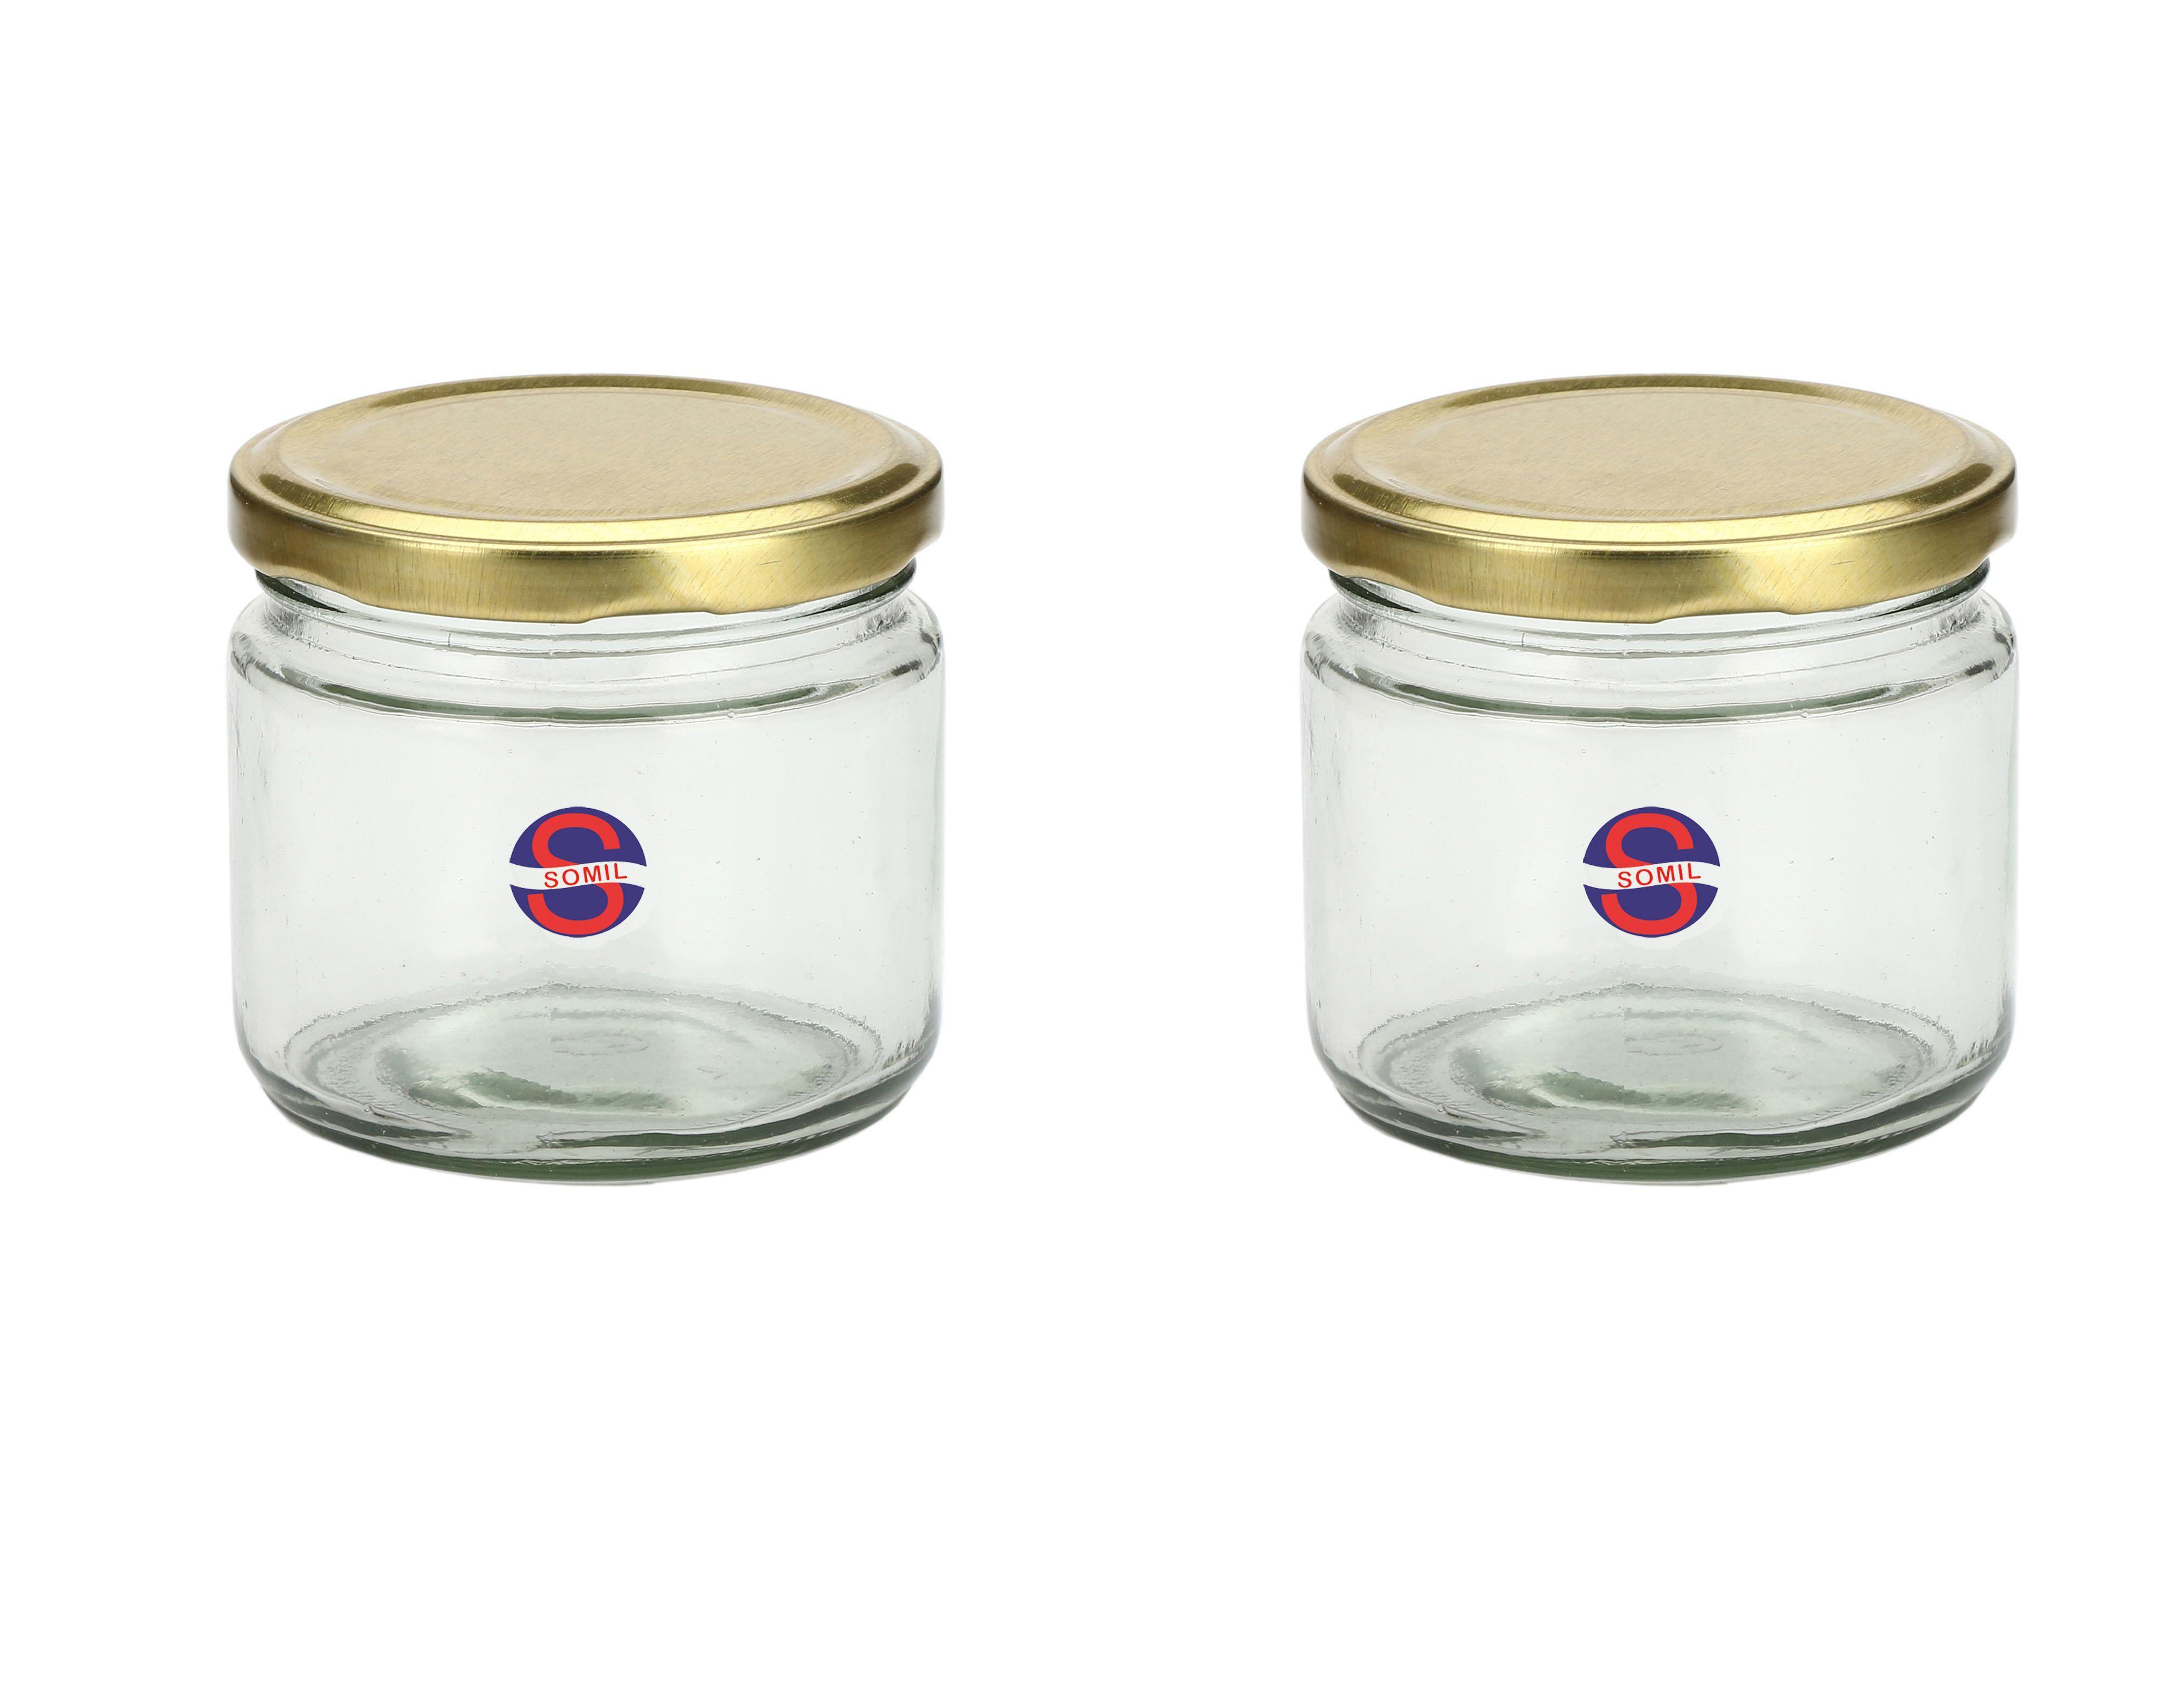 Somil Transparent Jar Glass Oil Container/Dispenser Set of 2 300 mL